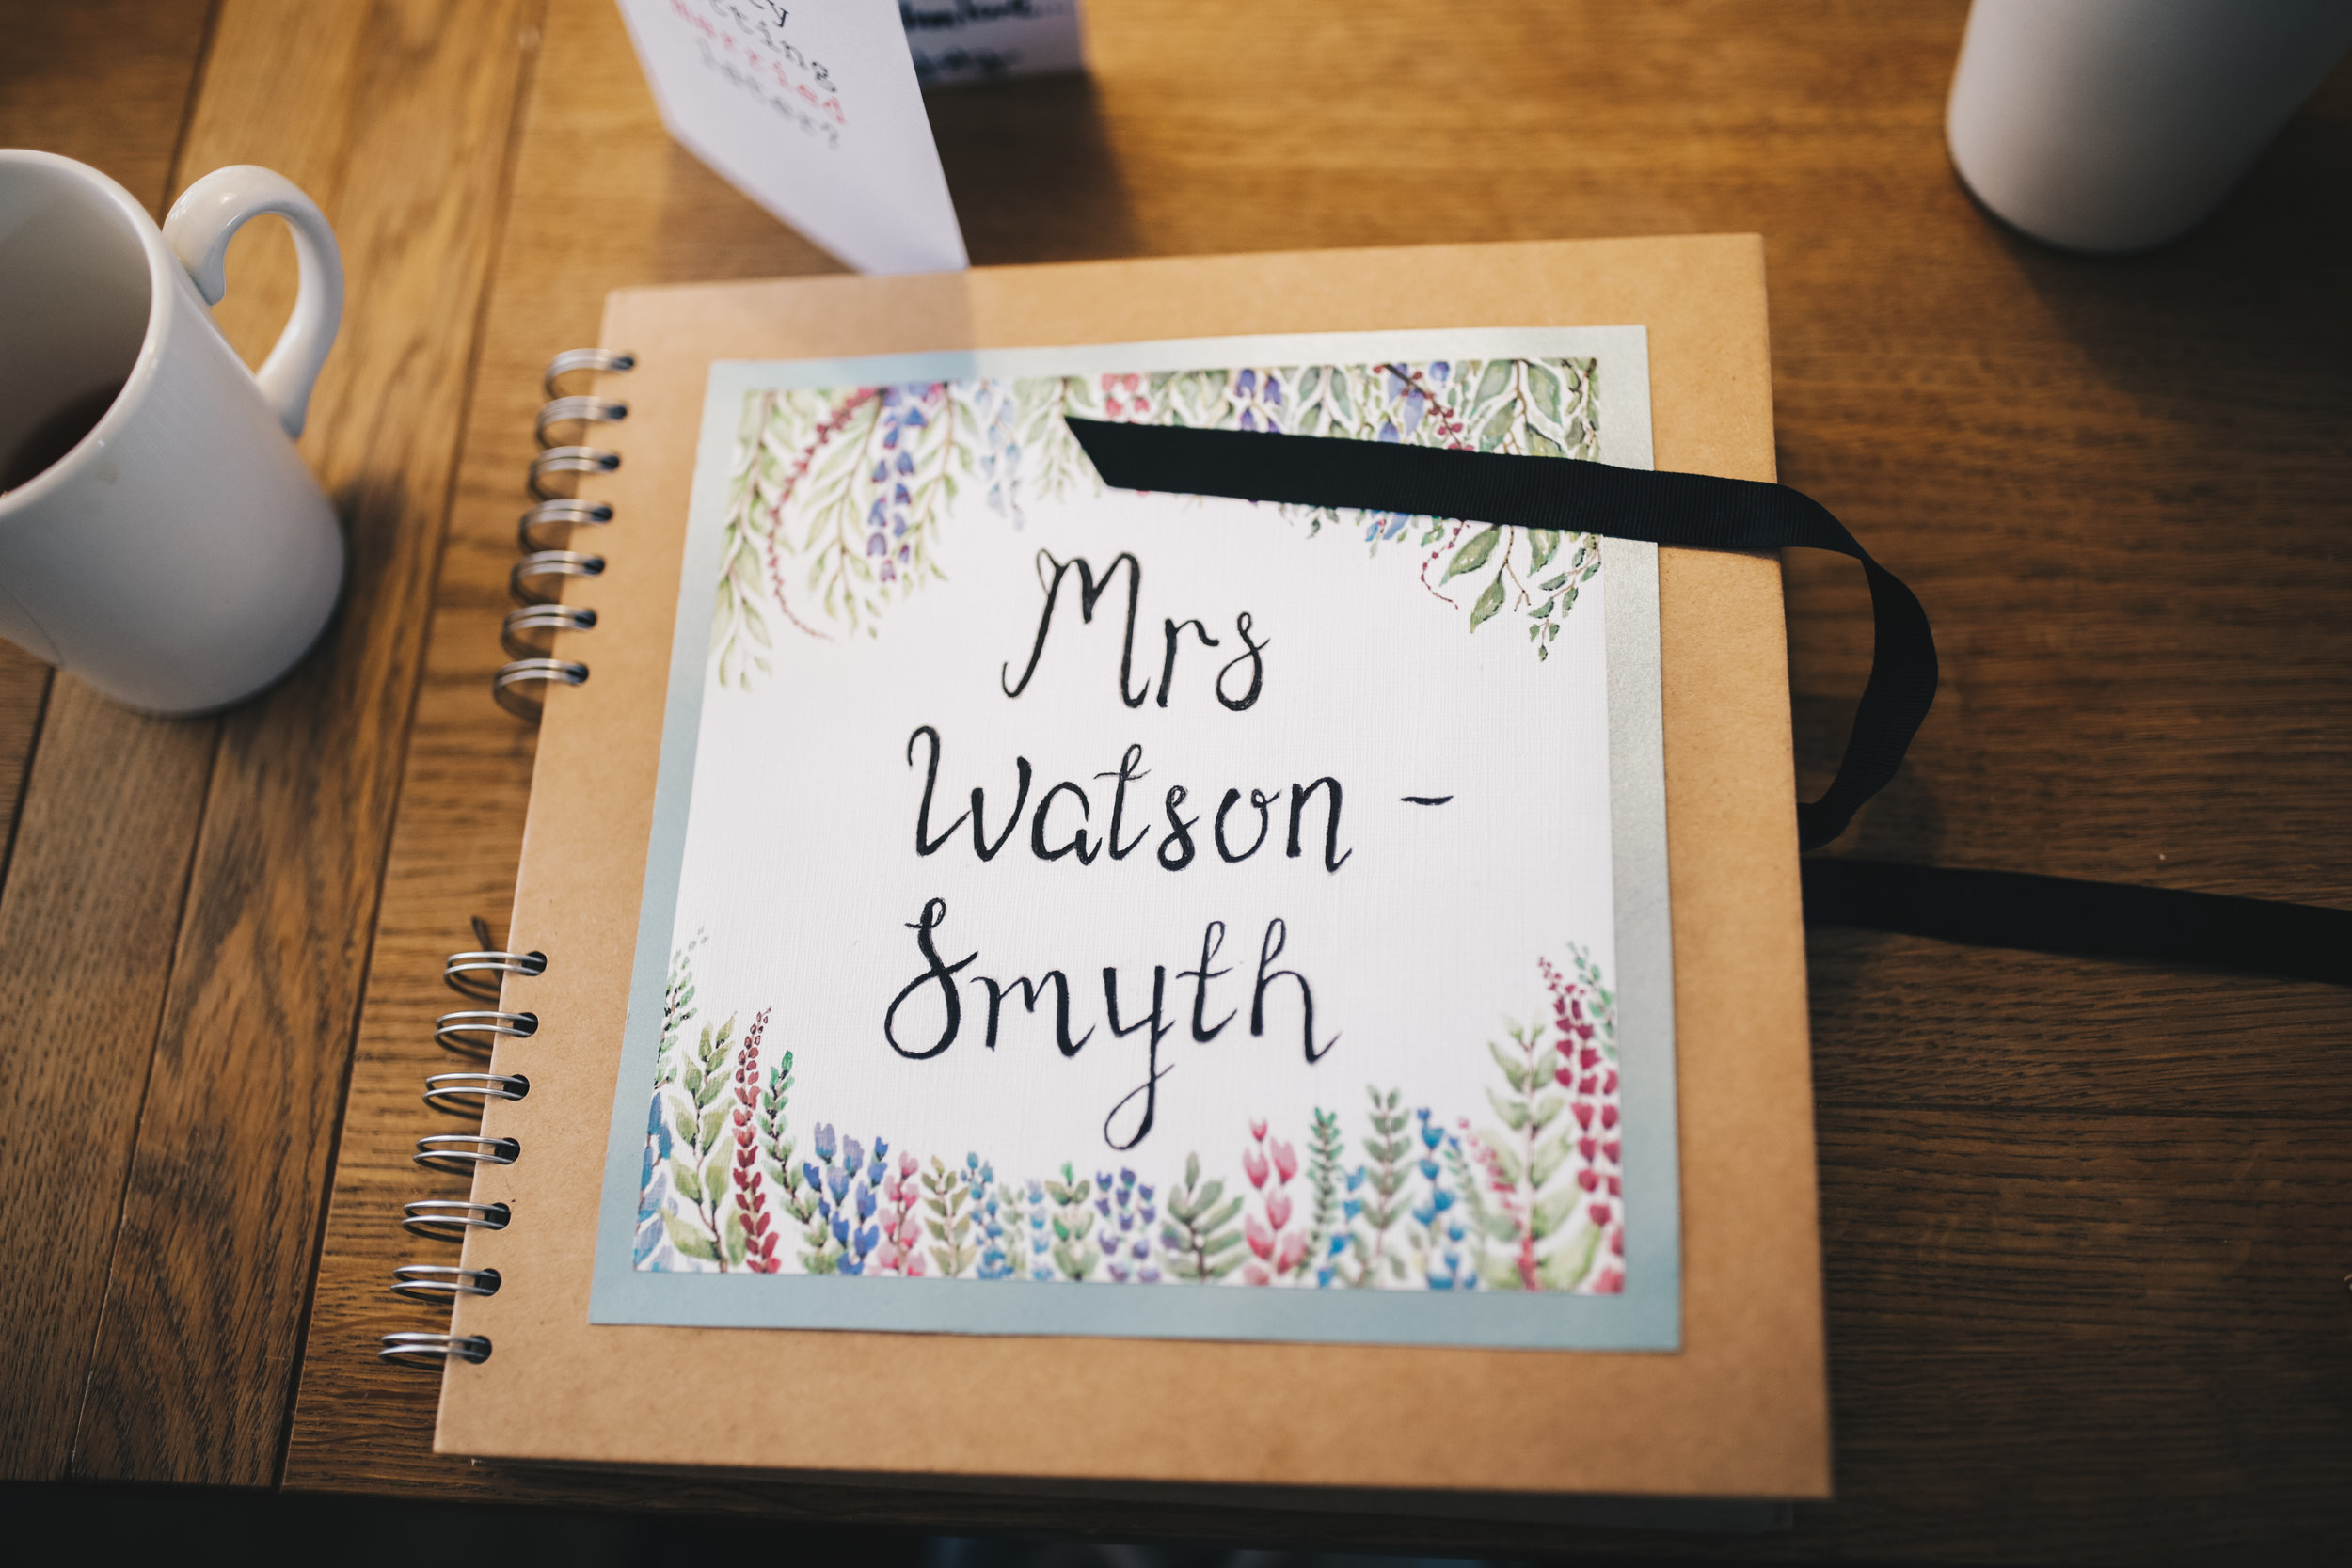 WatsonSmyth-3.jpg